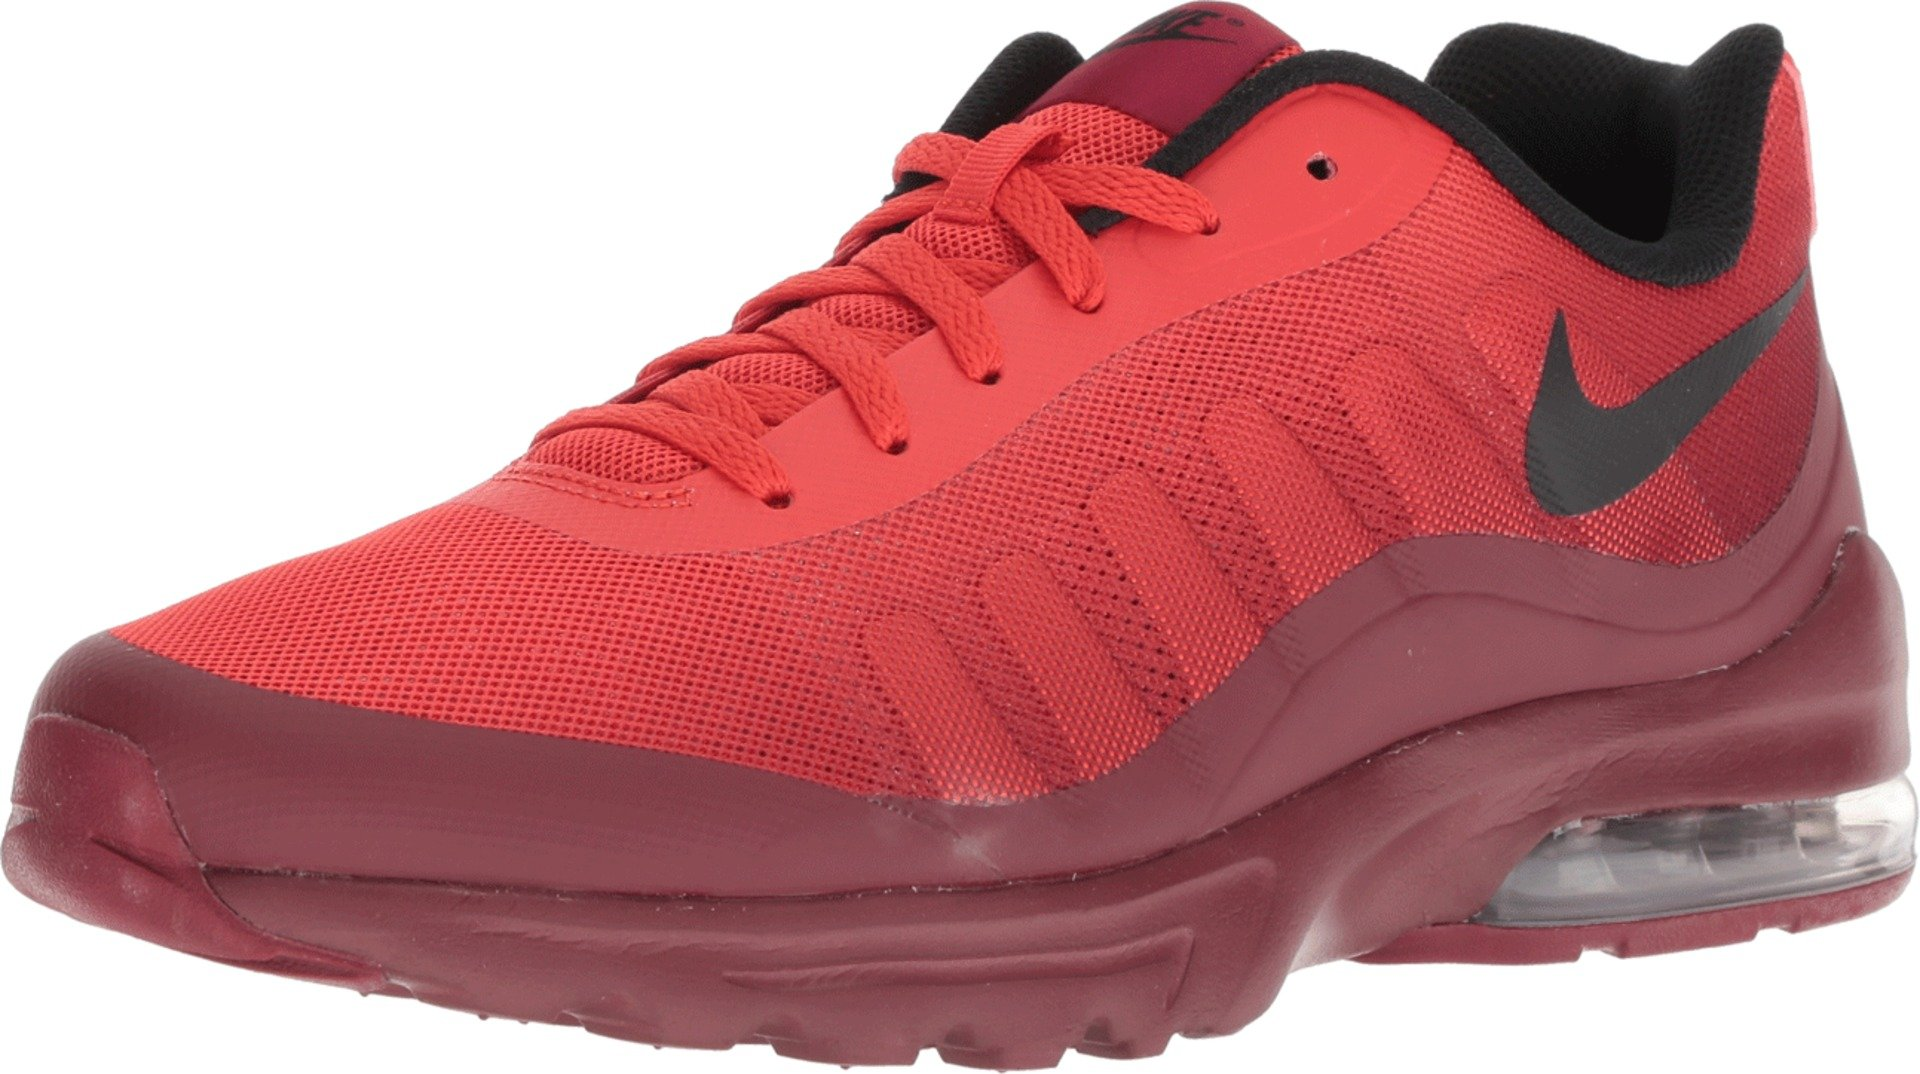 f7c32a5f95 Galleon - Nike Air Max Invigor Print Mens 749688-603 Size 8